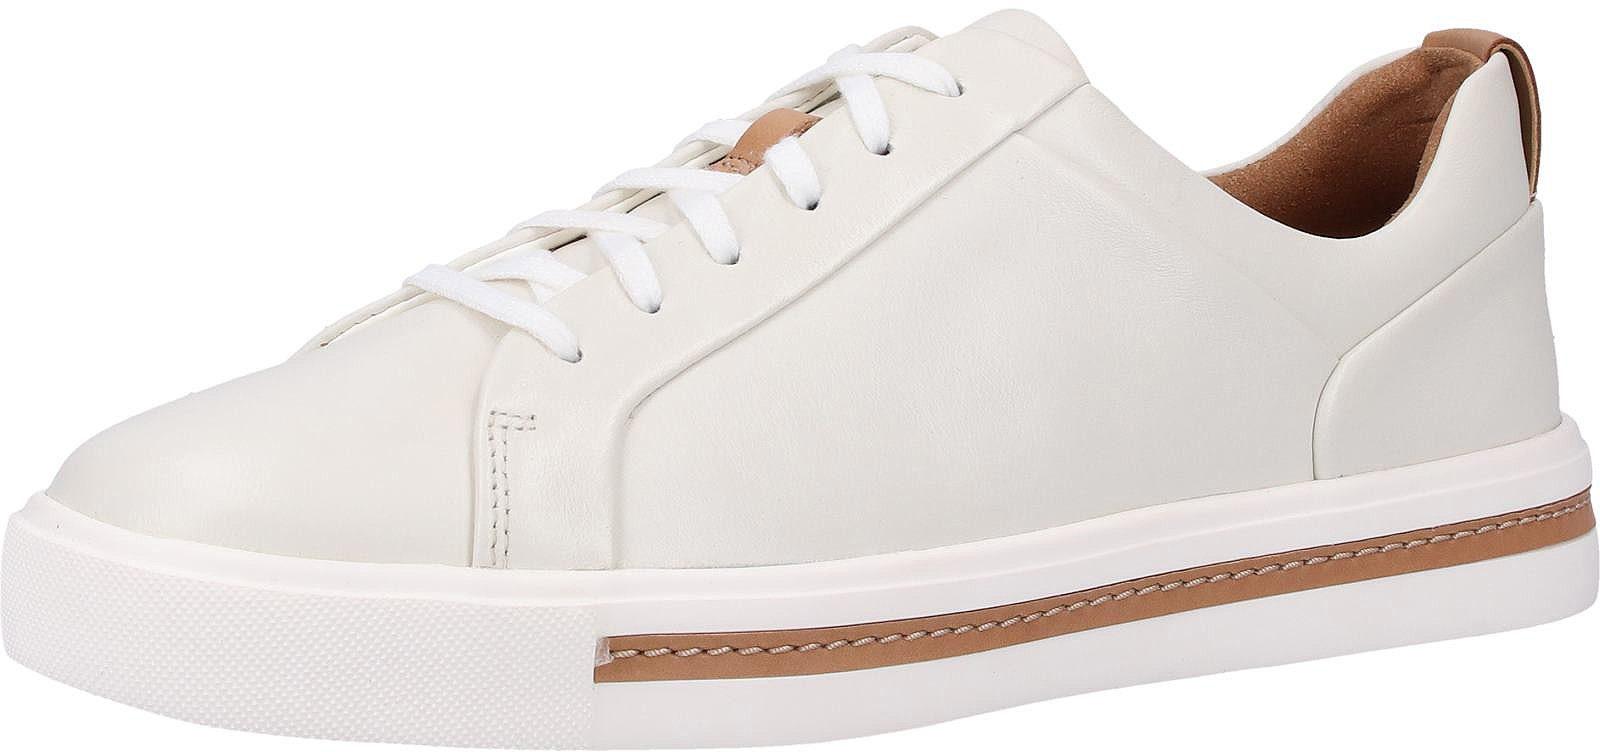 Clarks Sneaker Leder Weiß   Sneaker   Damenschuhe   surf4shoes